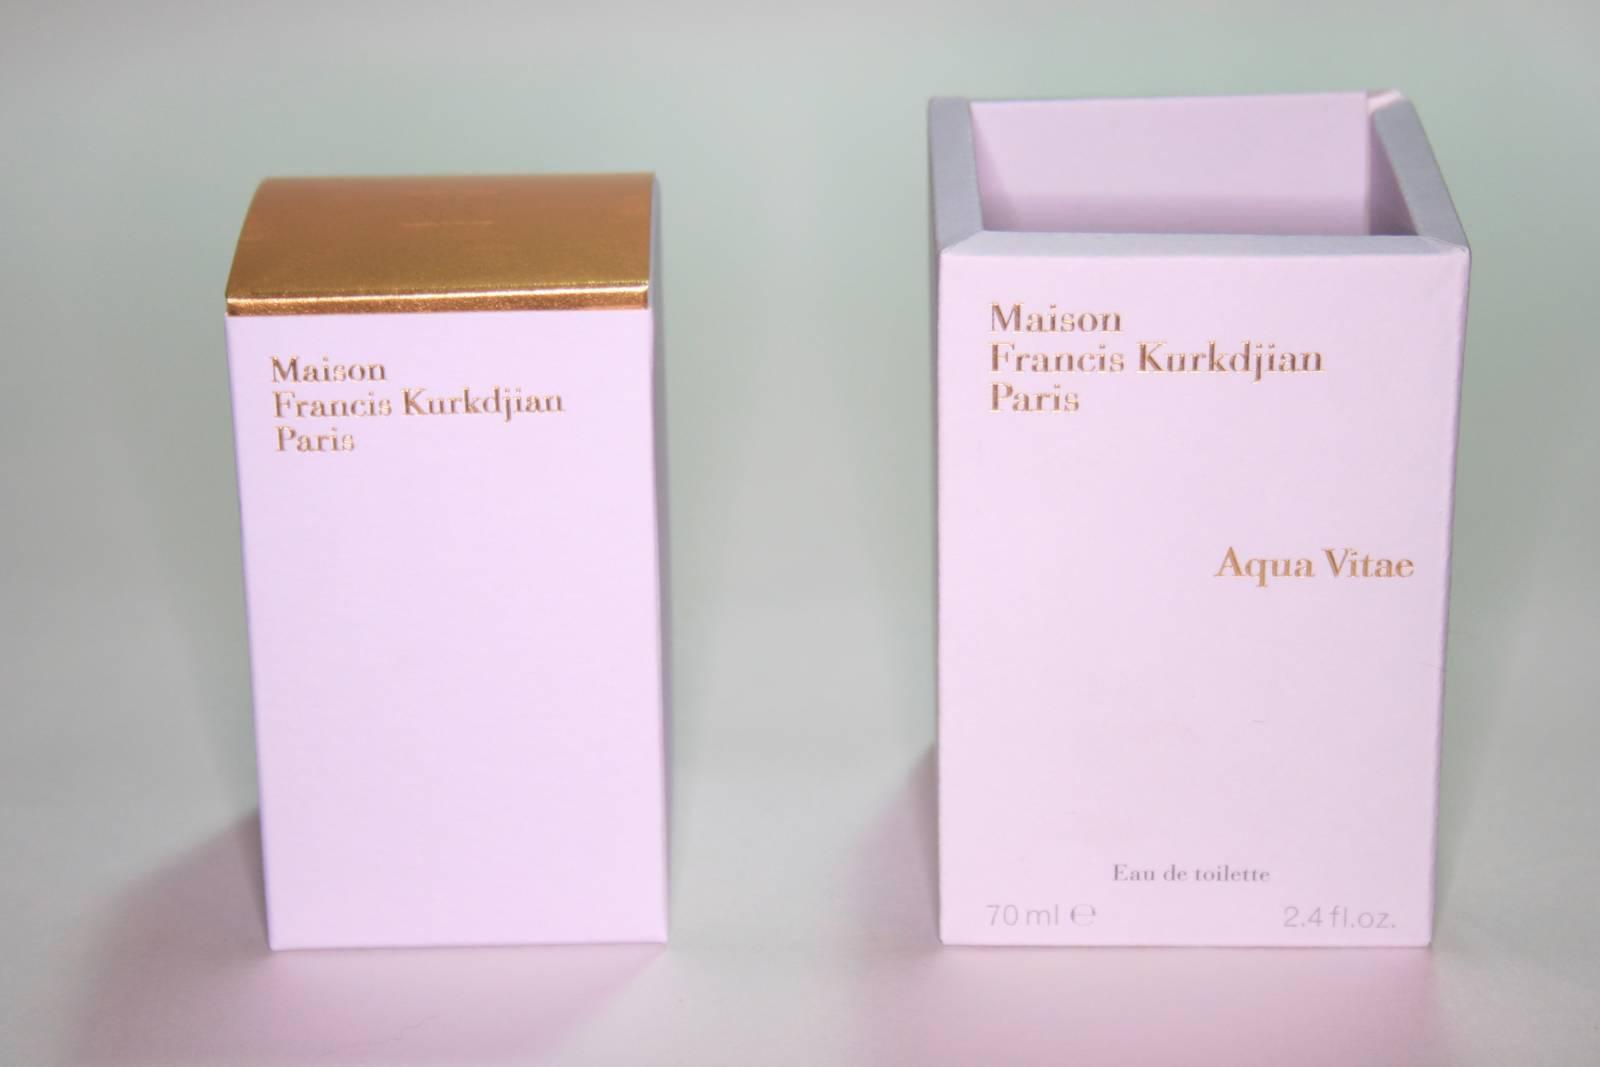 Maison francis kurkdjian paris aqua vitae review beauty for Aqua vitae maison francis kurkdjian